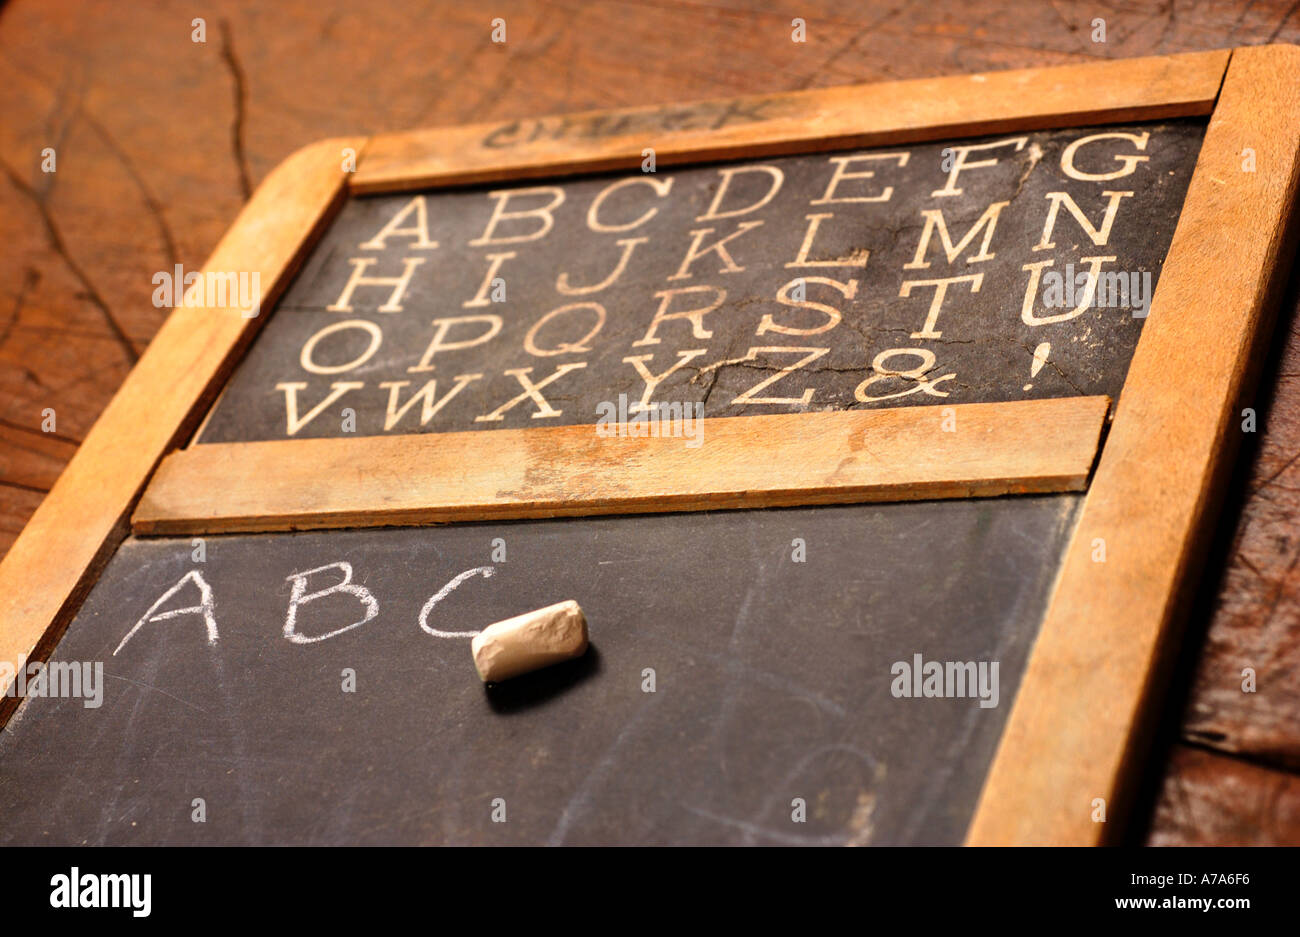 antique school chalkboard with ABC s written on it Stock Photo